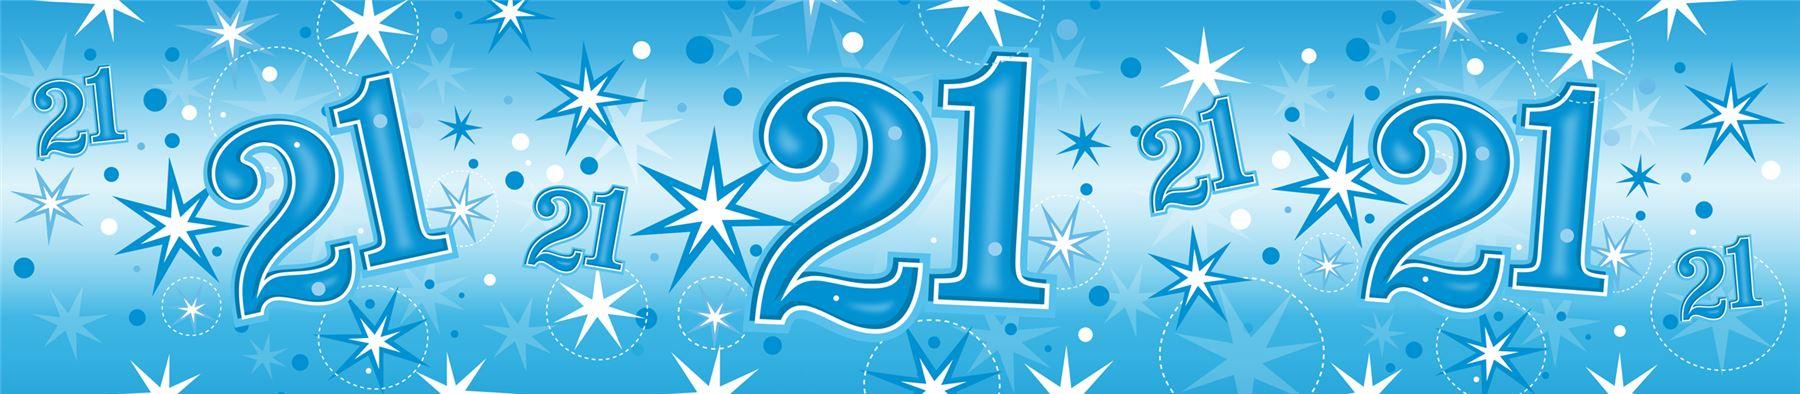 Blue Age 21 Male Happy 21st Birthday Banner Confetti ...